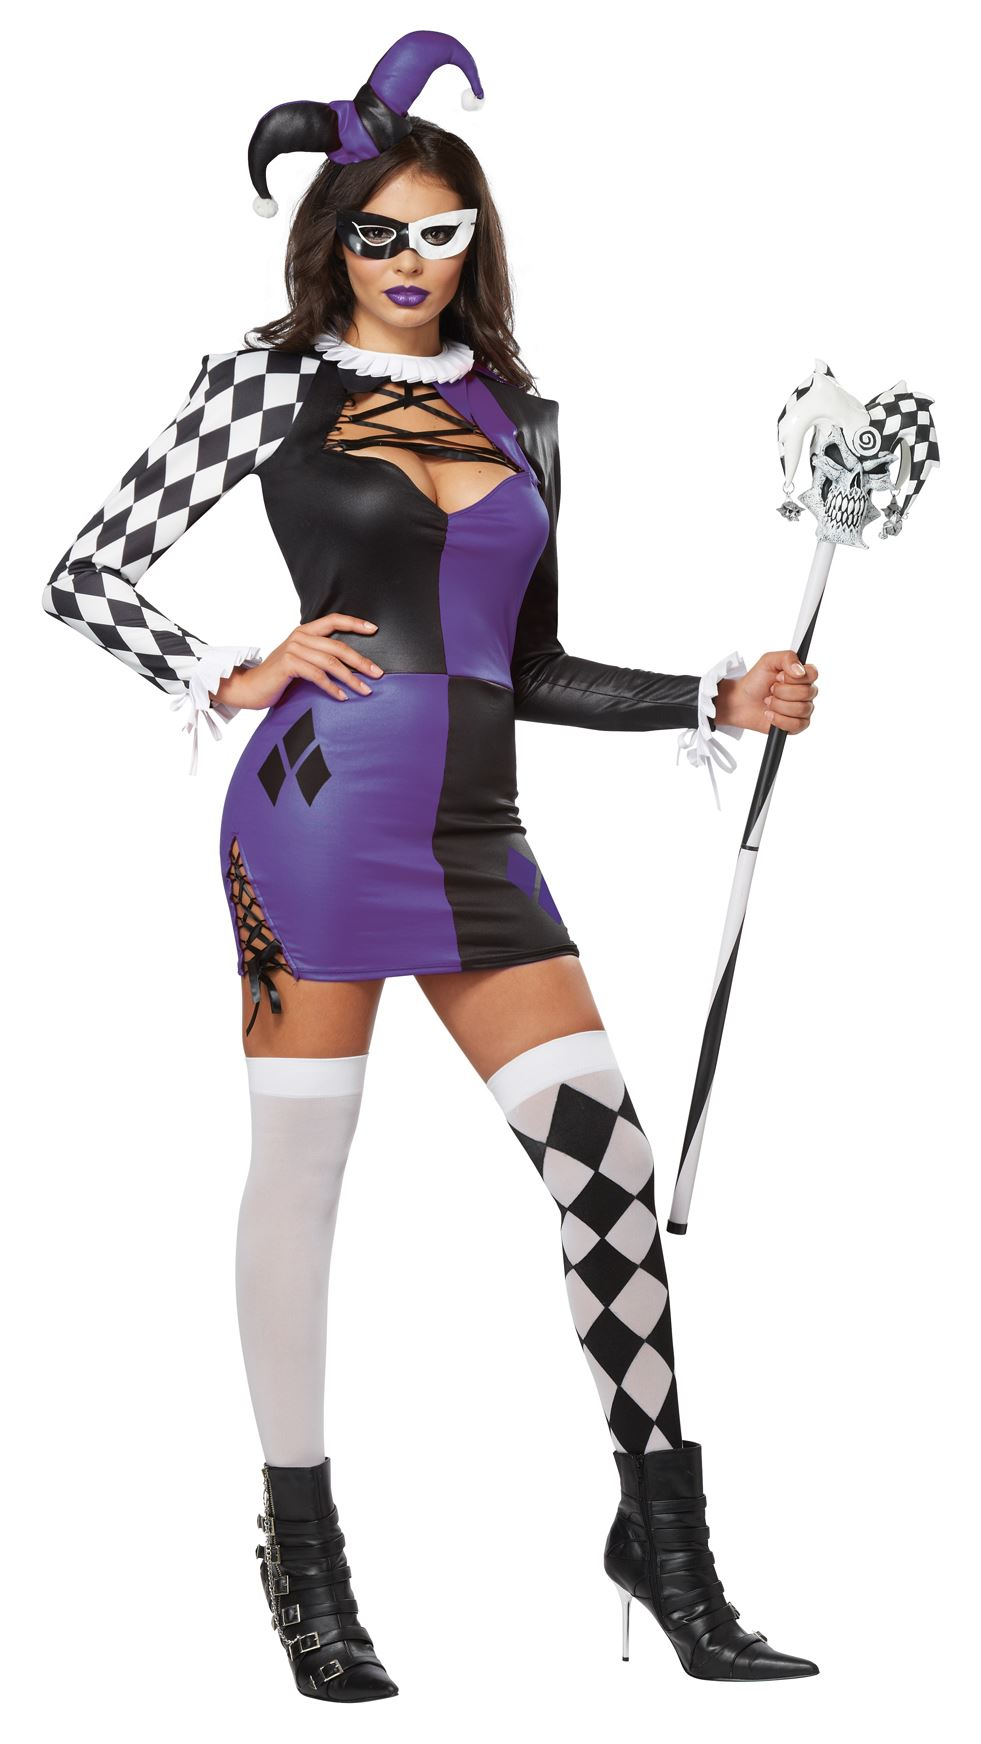 Adult Naughty Jester Women Halloween Costume  sc 1 st  The Costume Land & Adult Naughty Jester Women Halloween Costume | $23.99 | The Costume Land